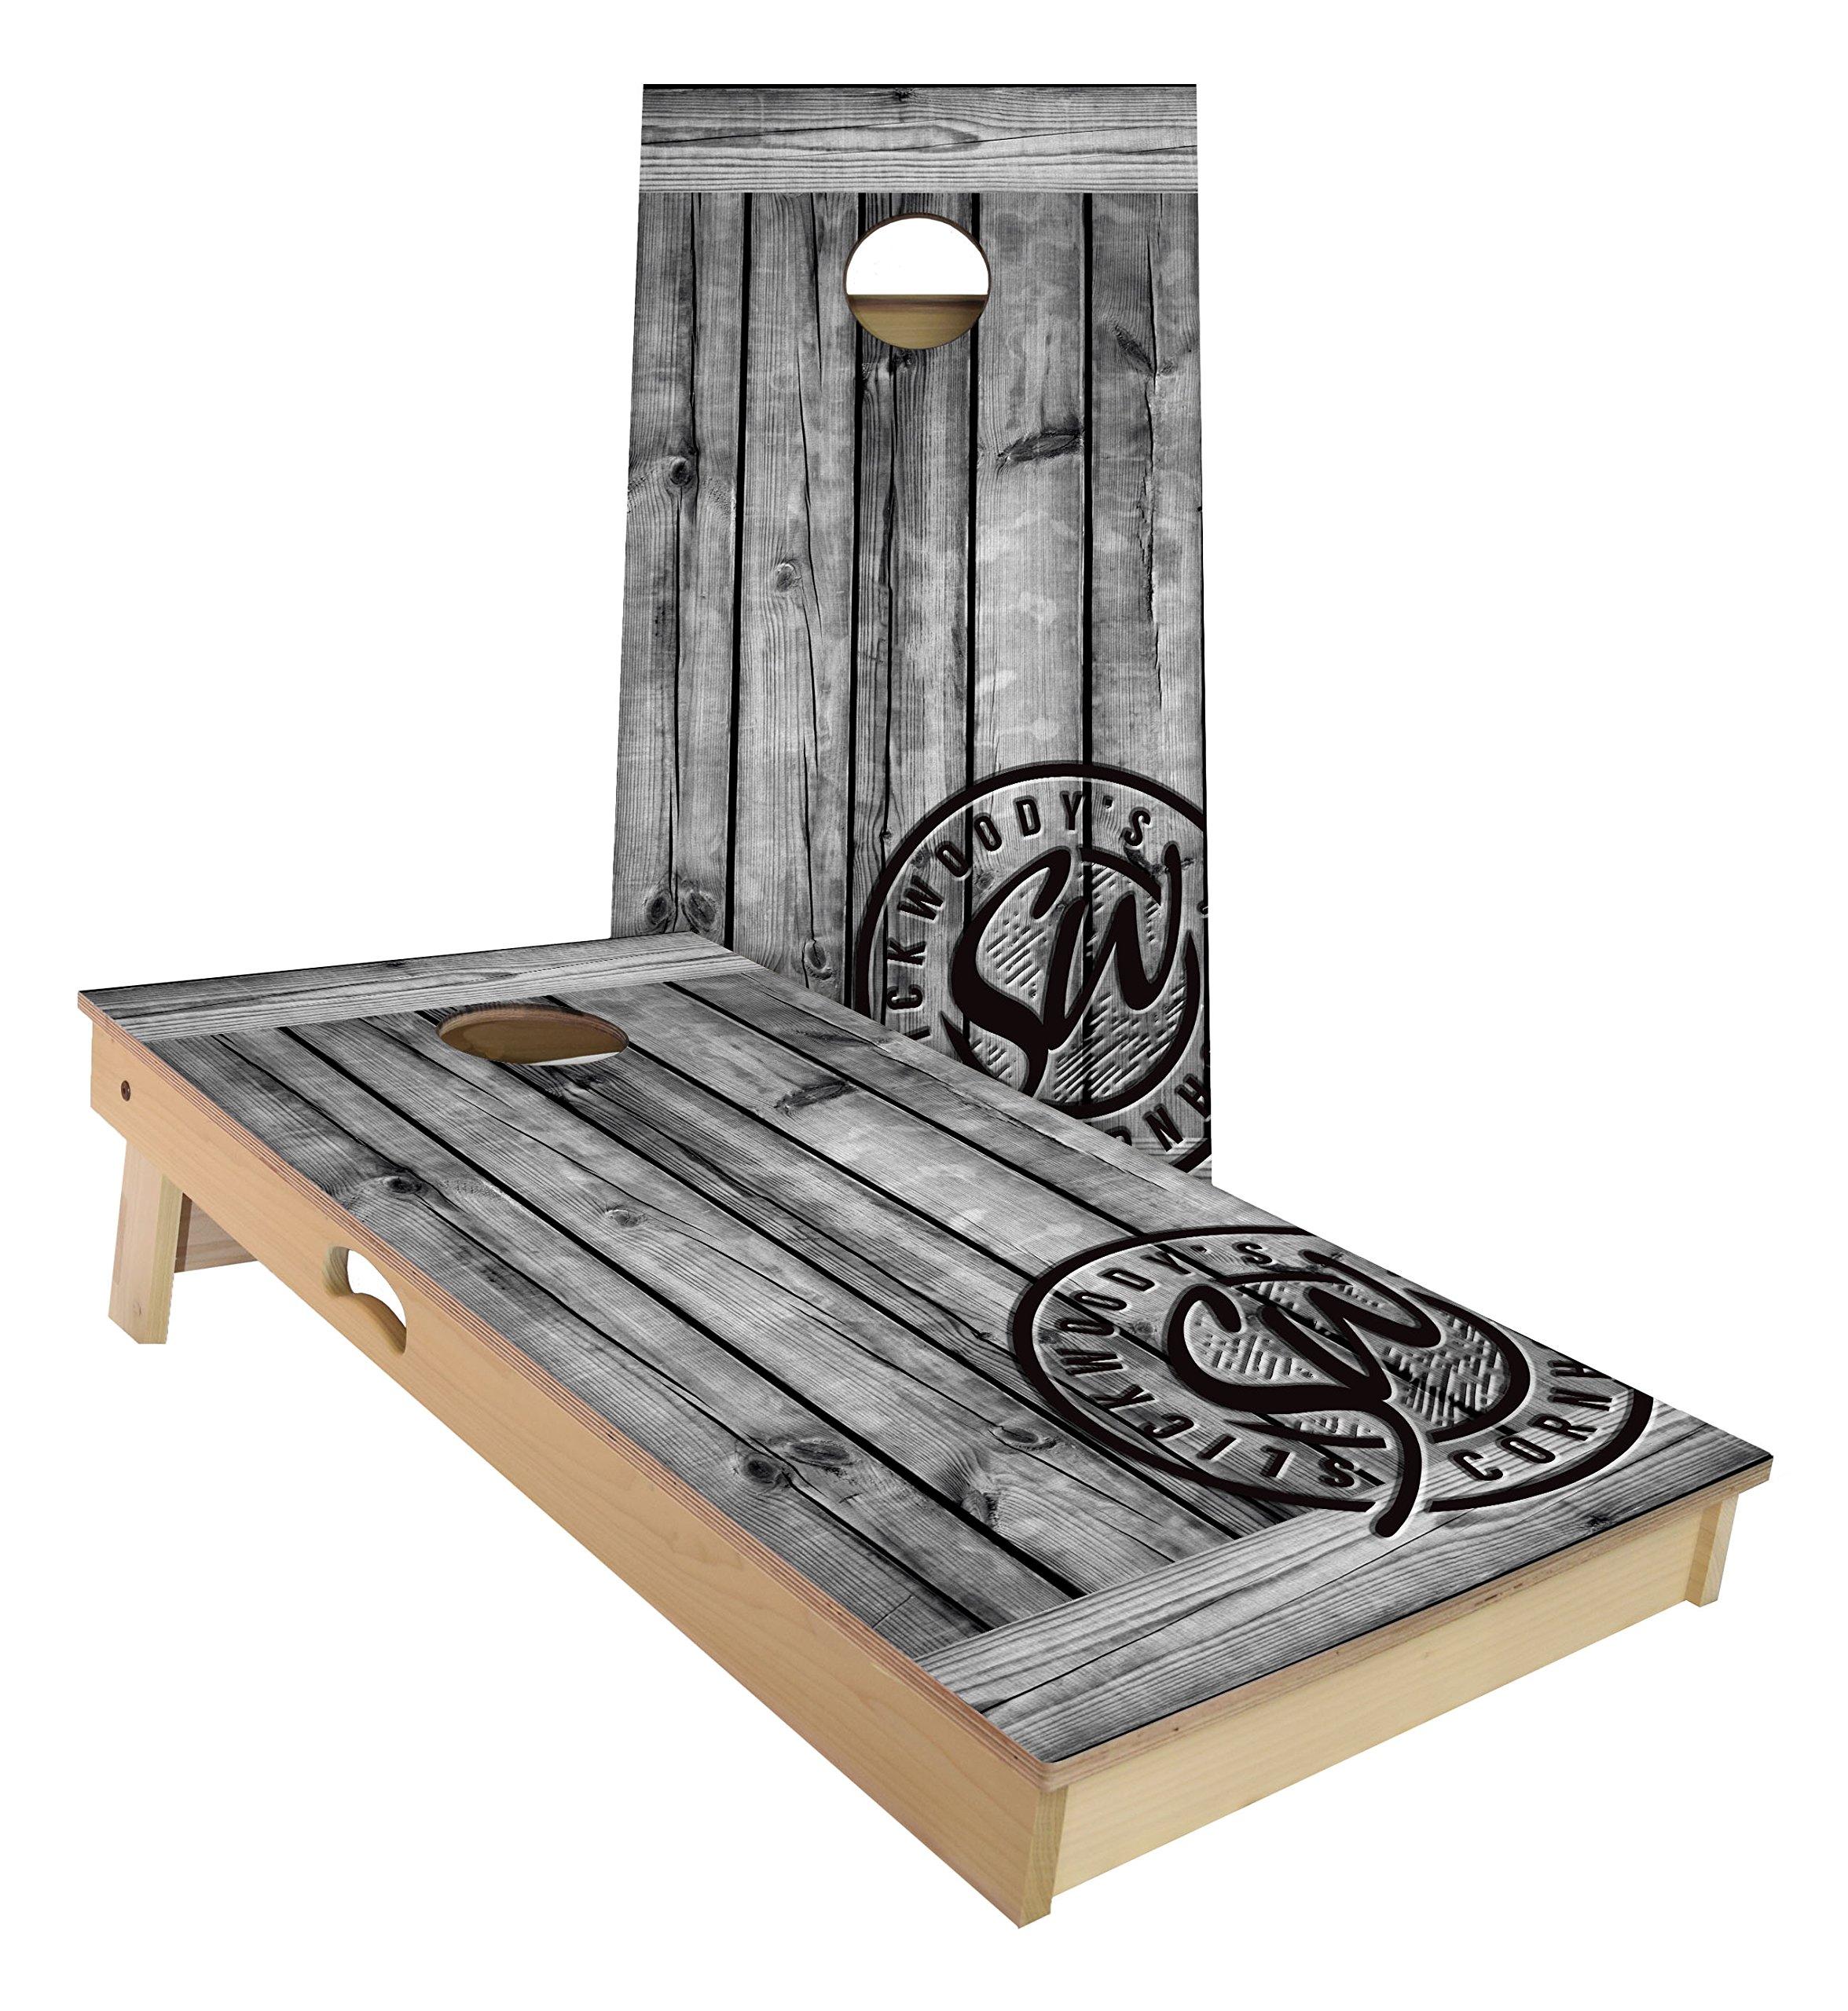 Rustic Grey Barnwood Cornhole Set 4 by 2 feet | Slick Woody's